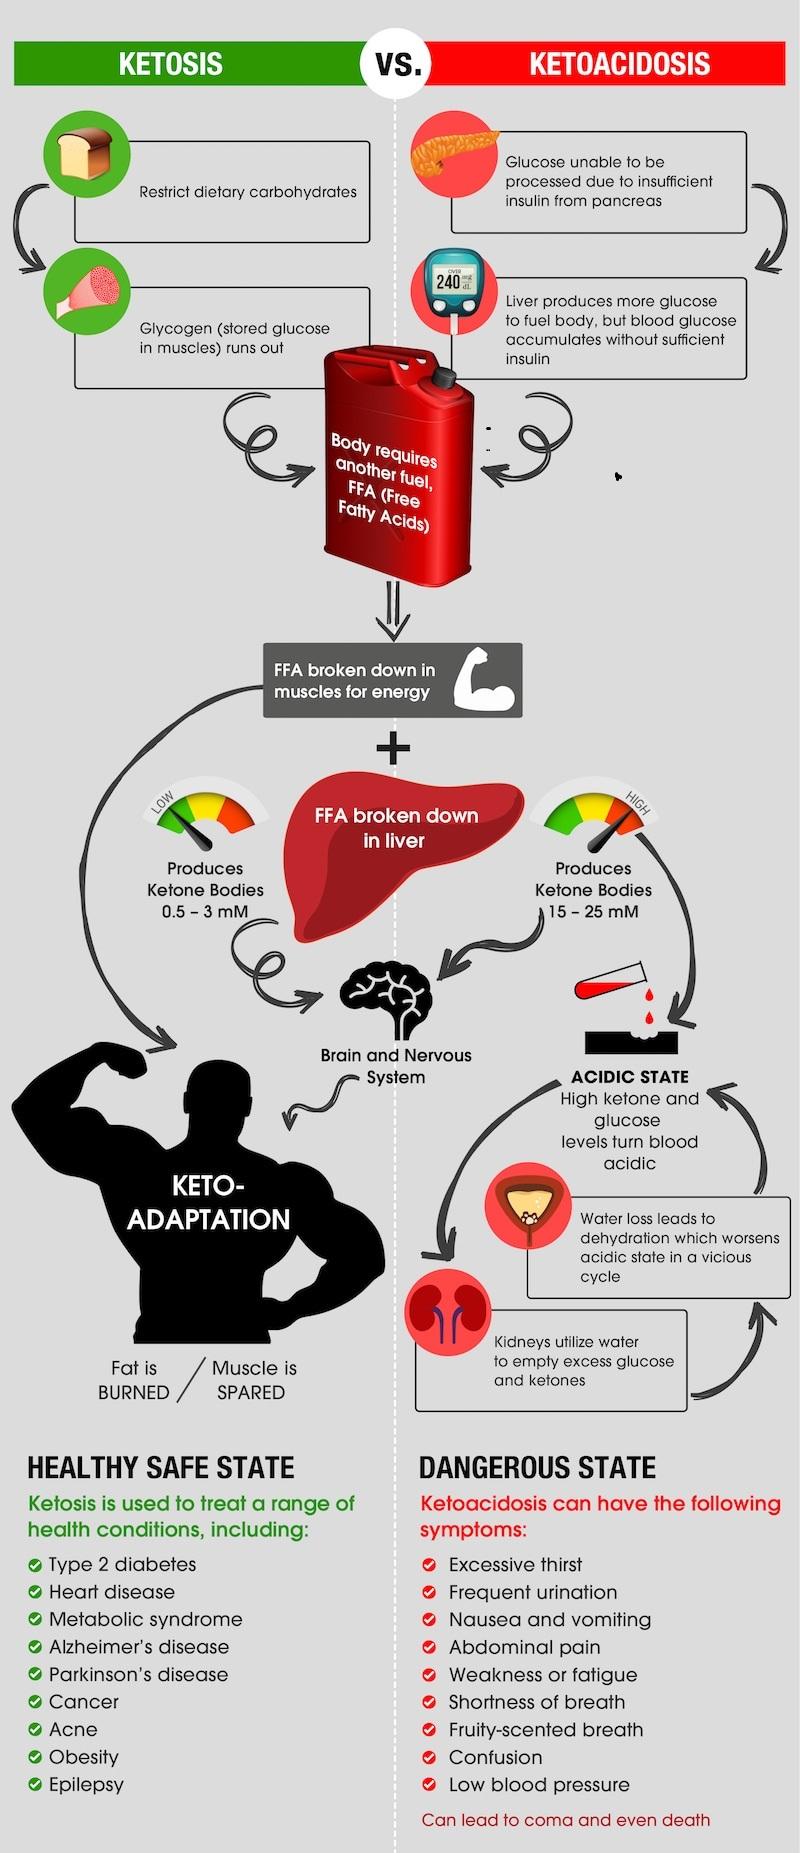 ketosis-vs-ketoacidosis